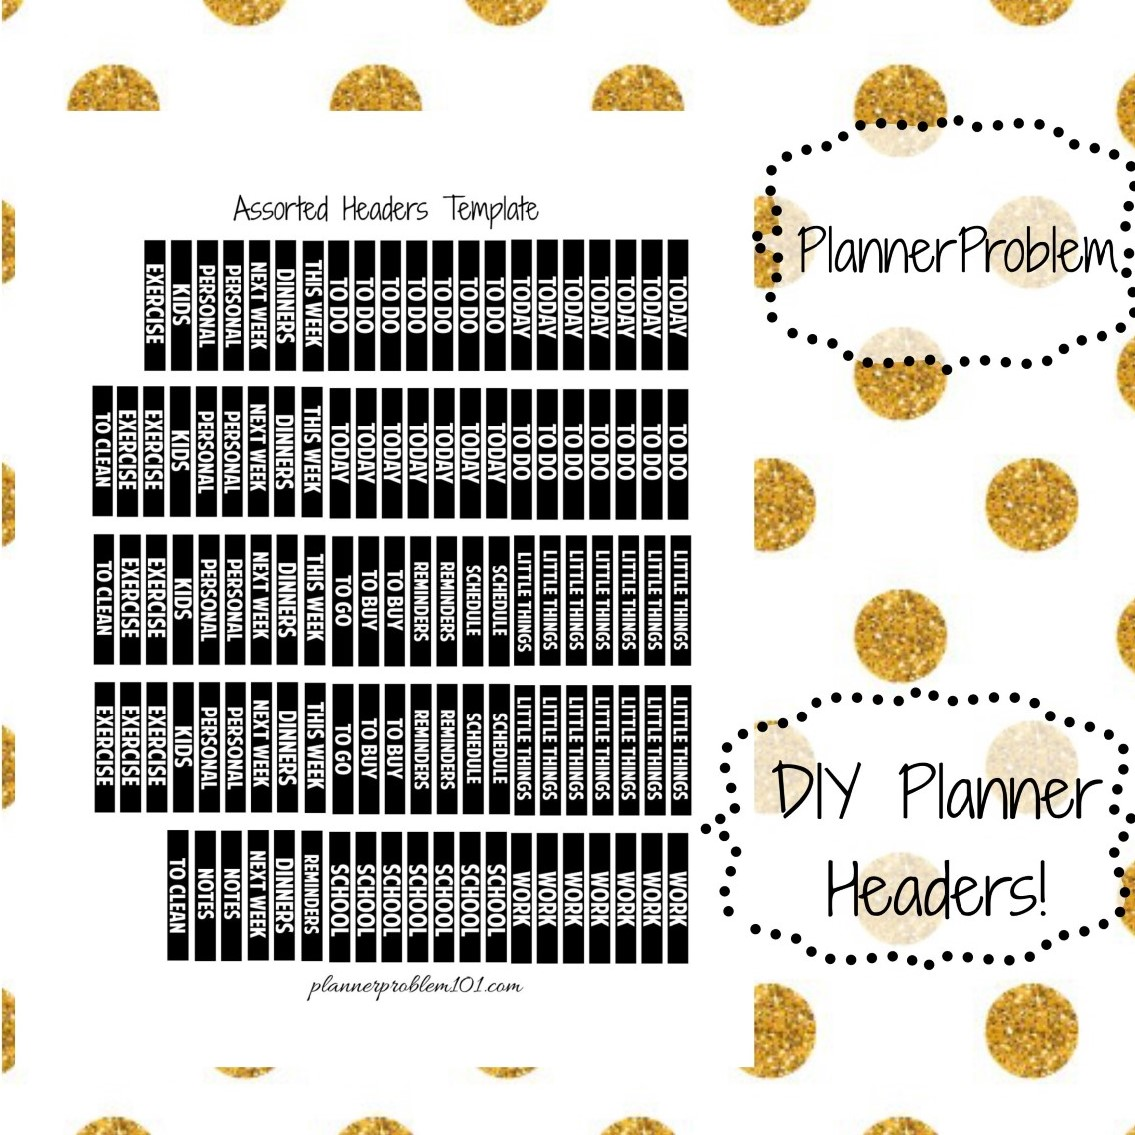 *NEW* Customizable Headers Template! | Free Printable ...